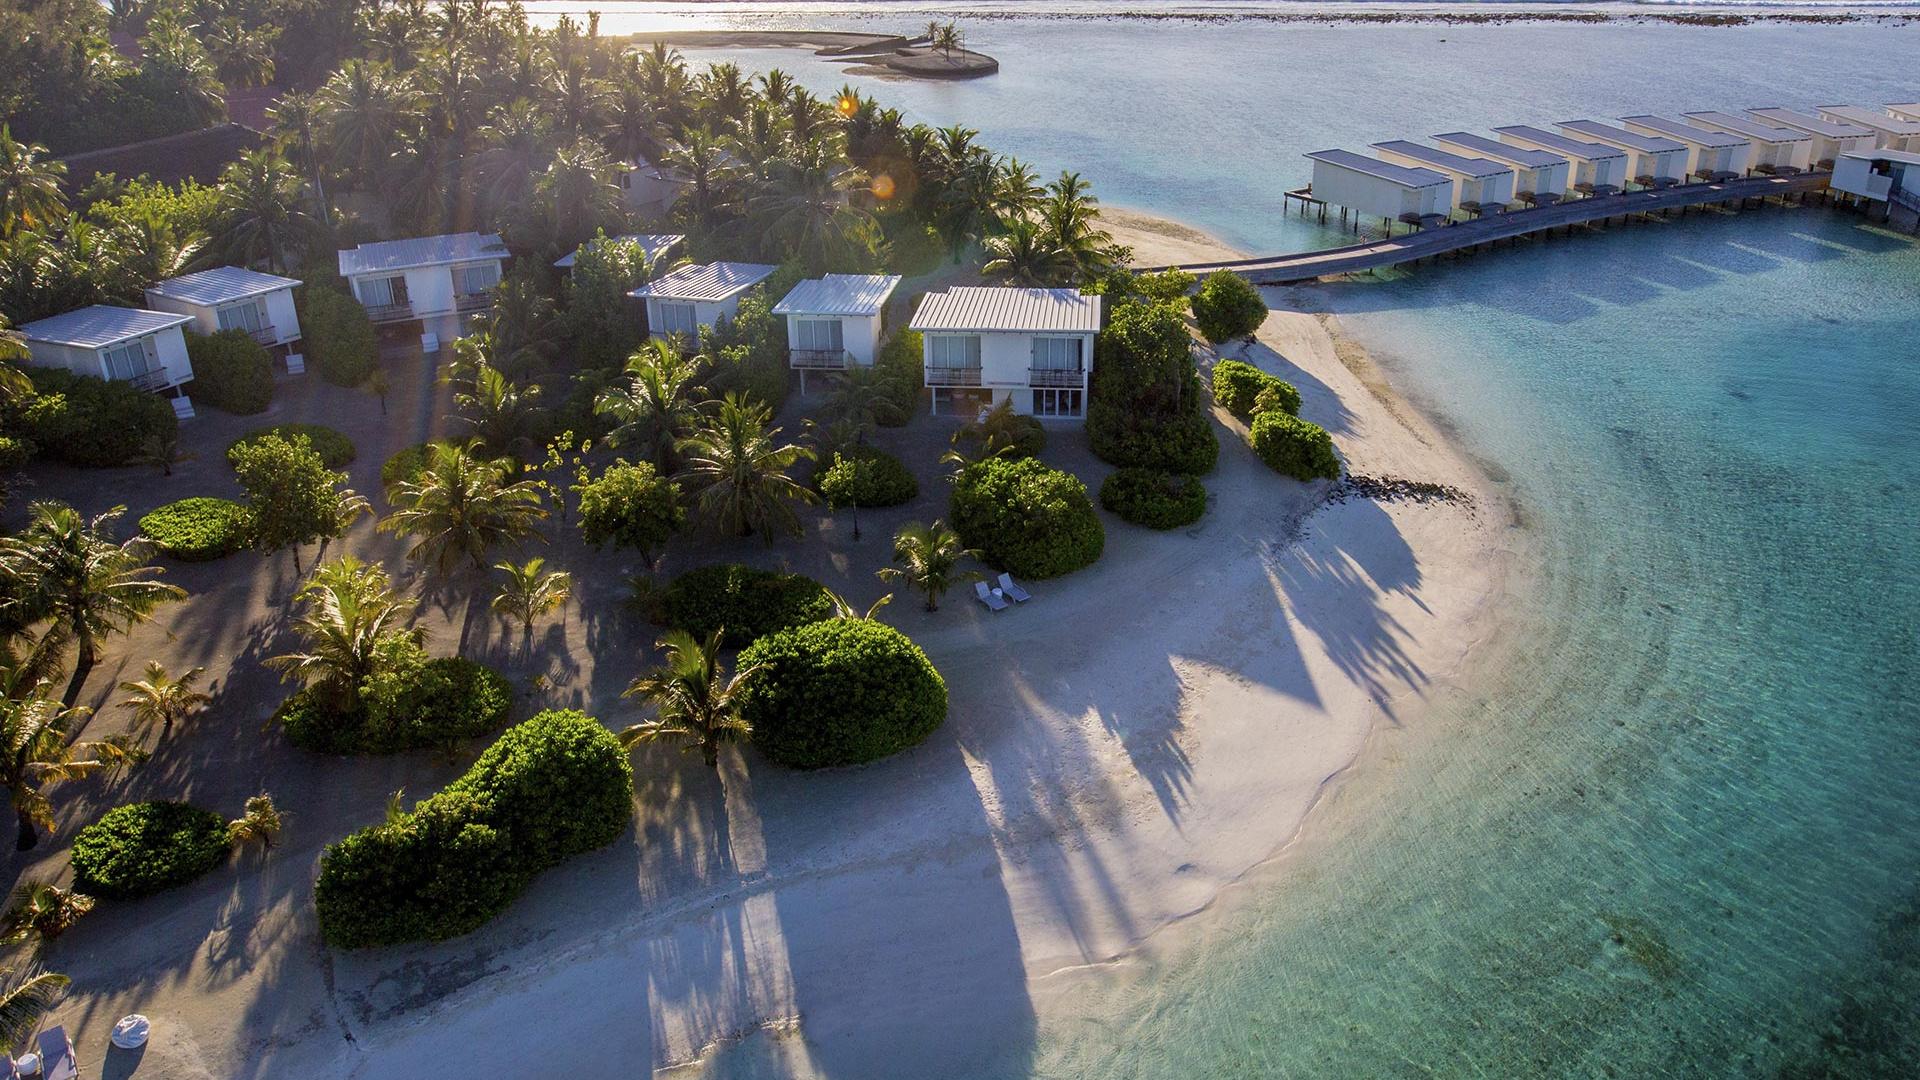 Aerial view of Holiday Inn Kandooma Resort